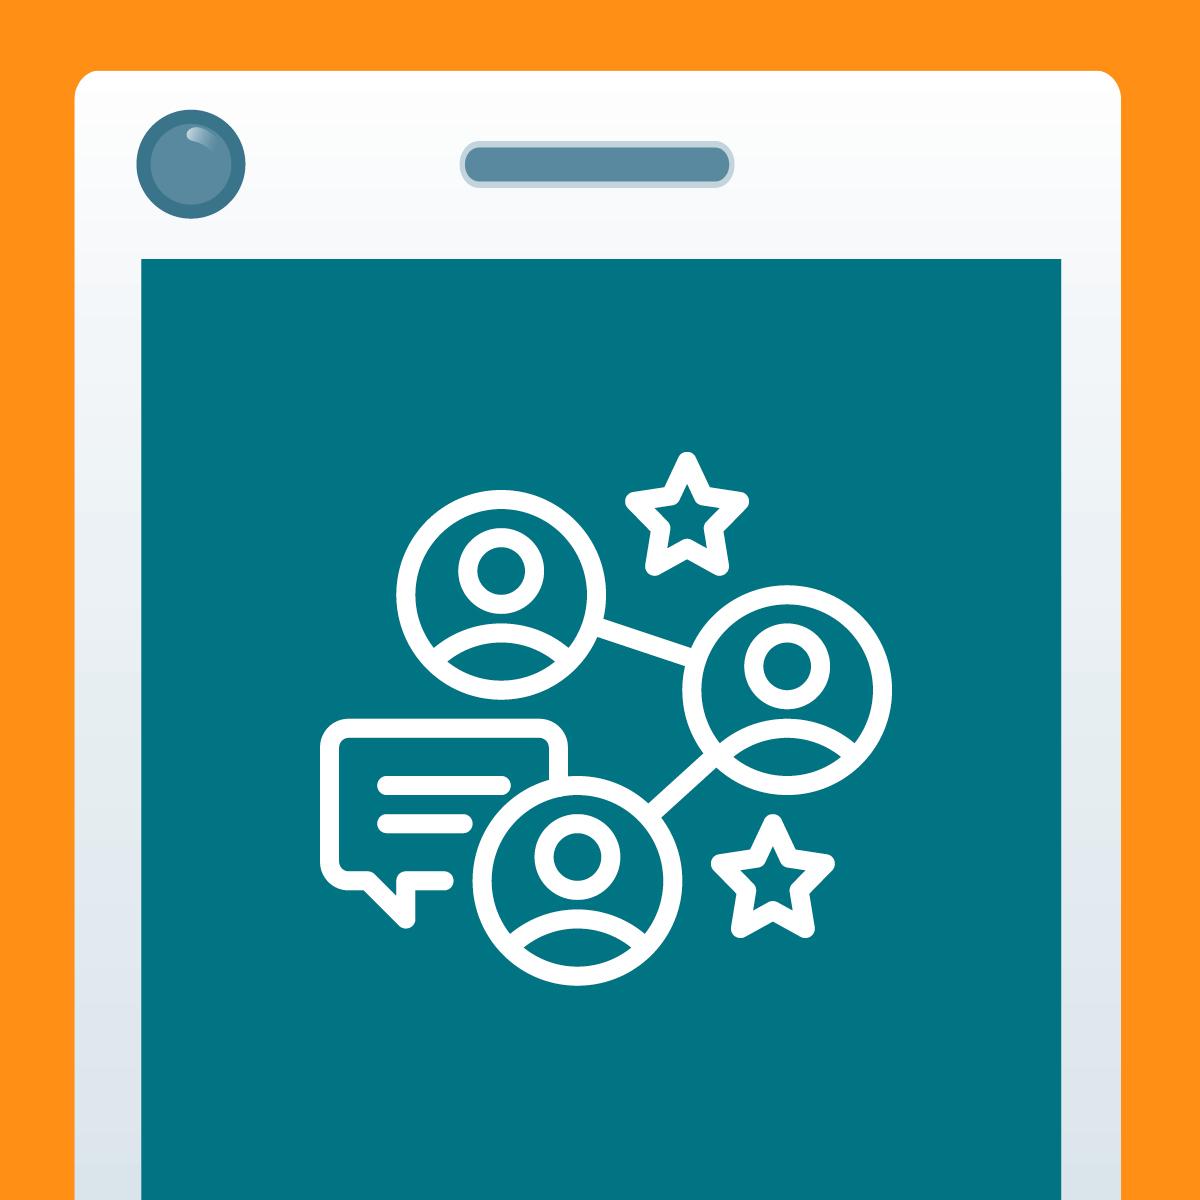 Online/Digital Marketing - Email Marketing